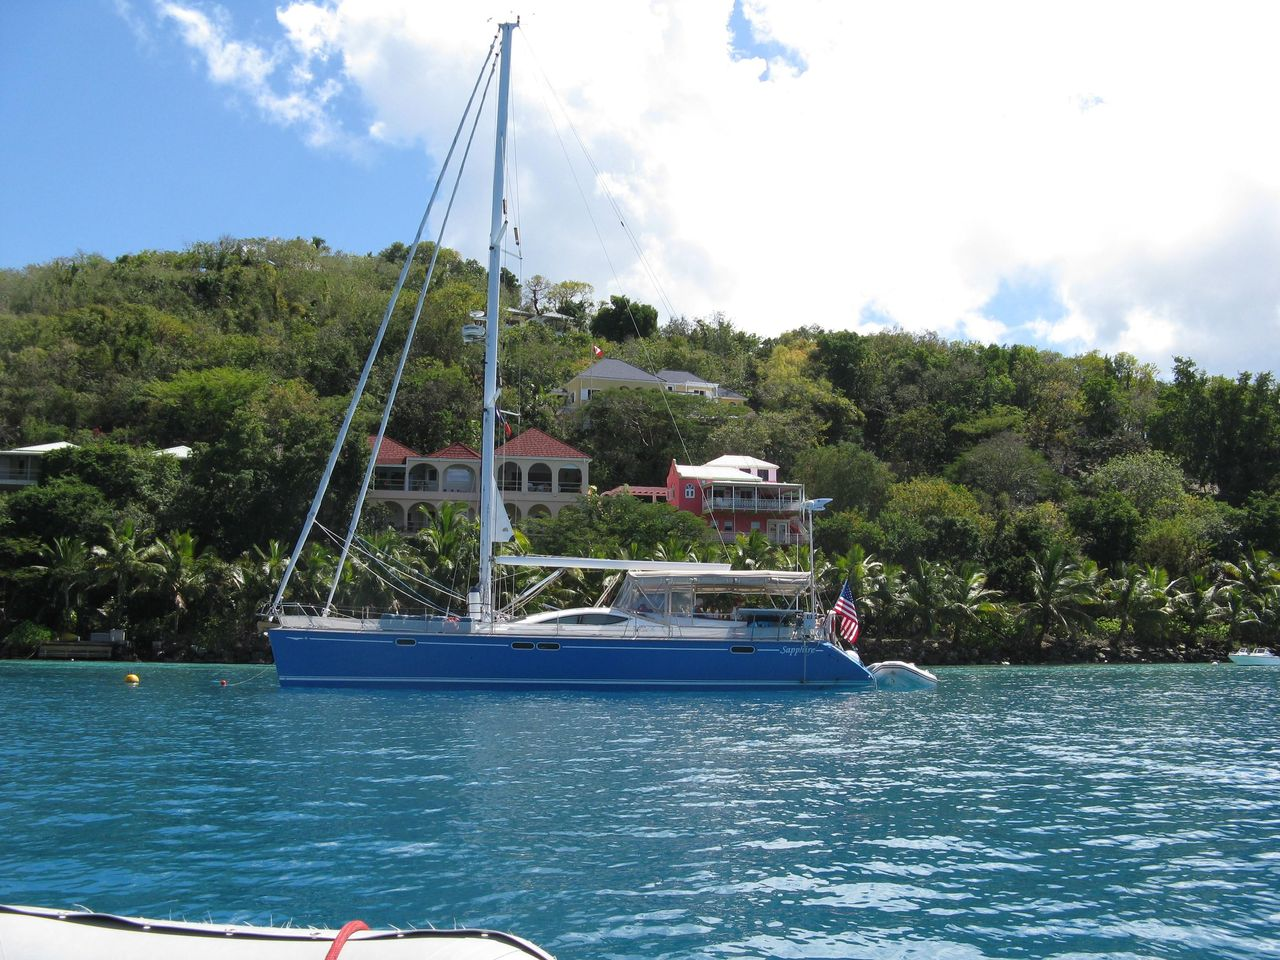 2004 Used Jeanneau Sun Odyssey 54 Ds Cruiser Sailboat For Sale